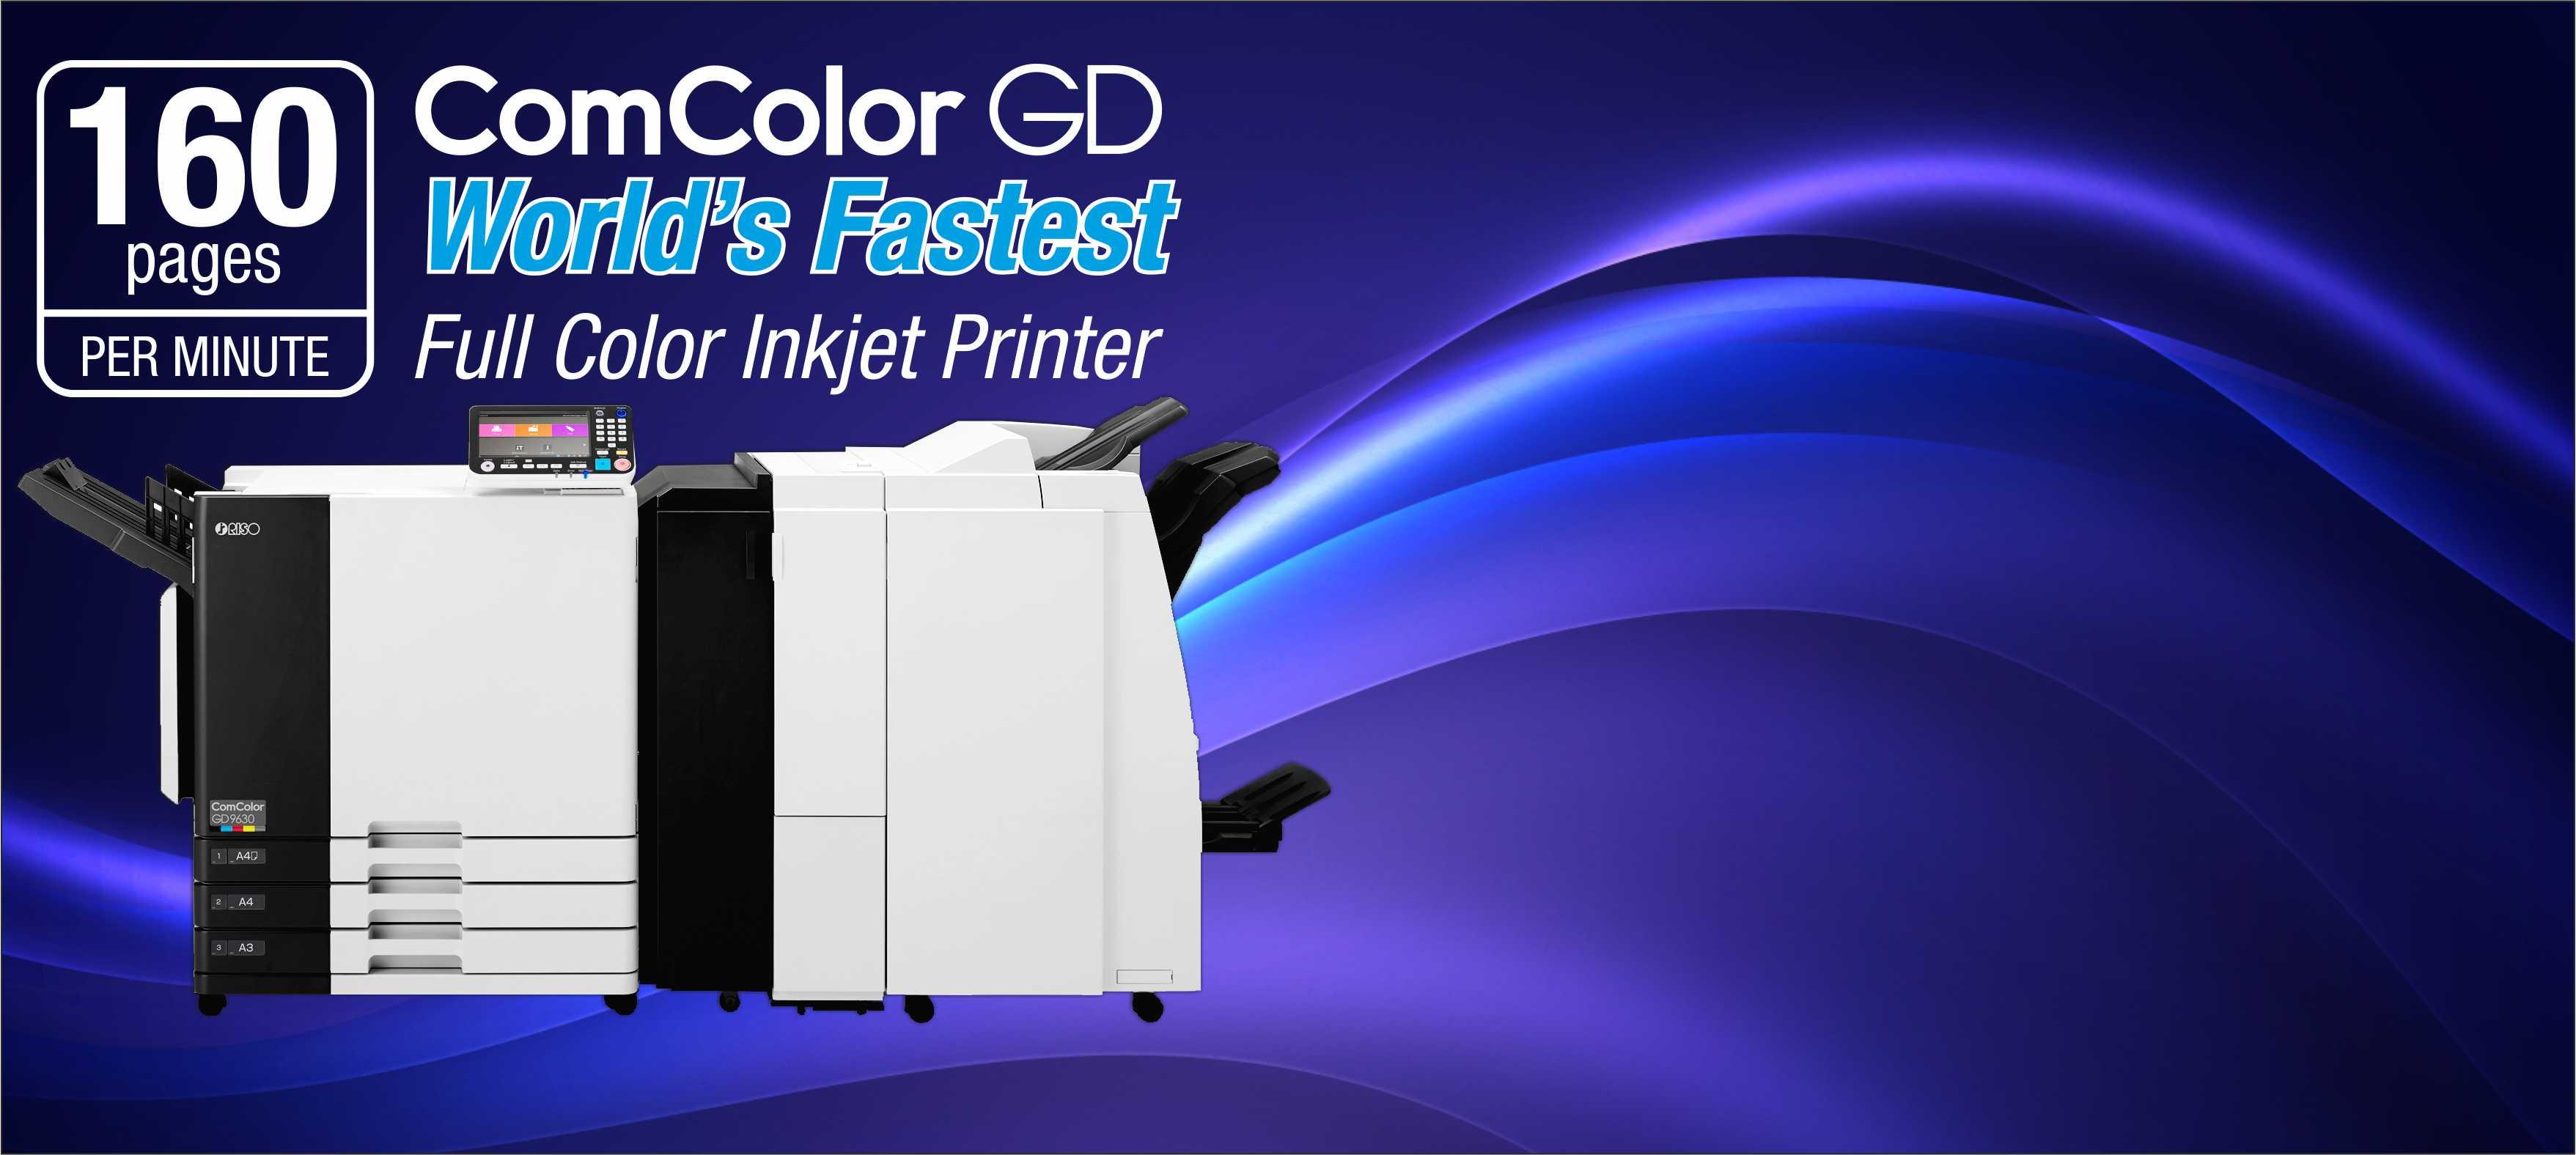 GD Inkjet Printer